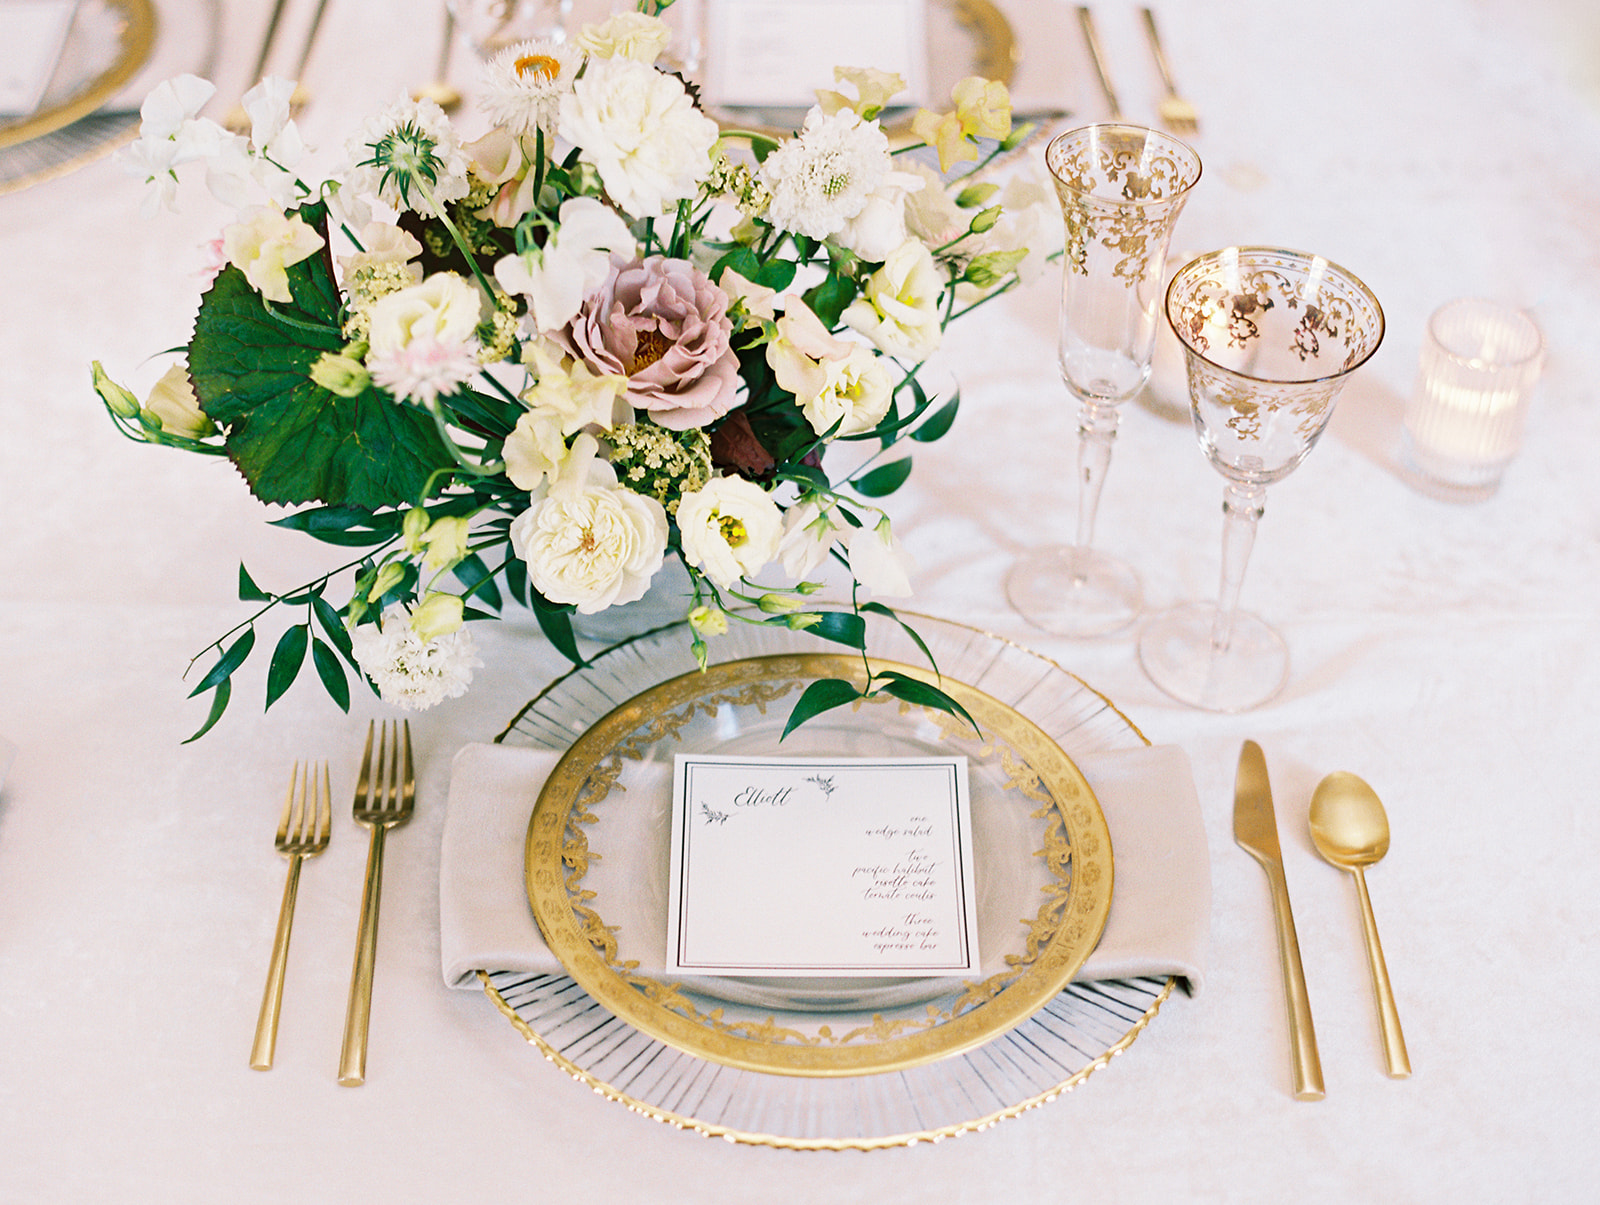 Fine art wedding inspiration by Alexa Kay Events